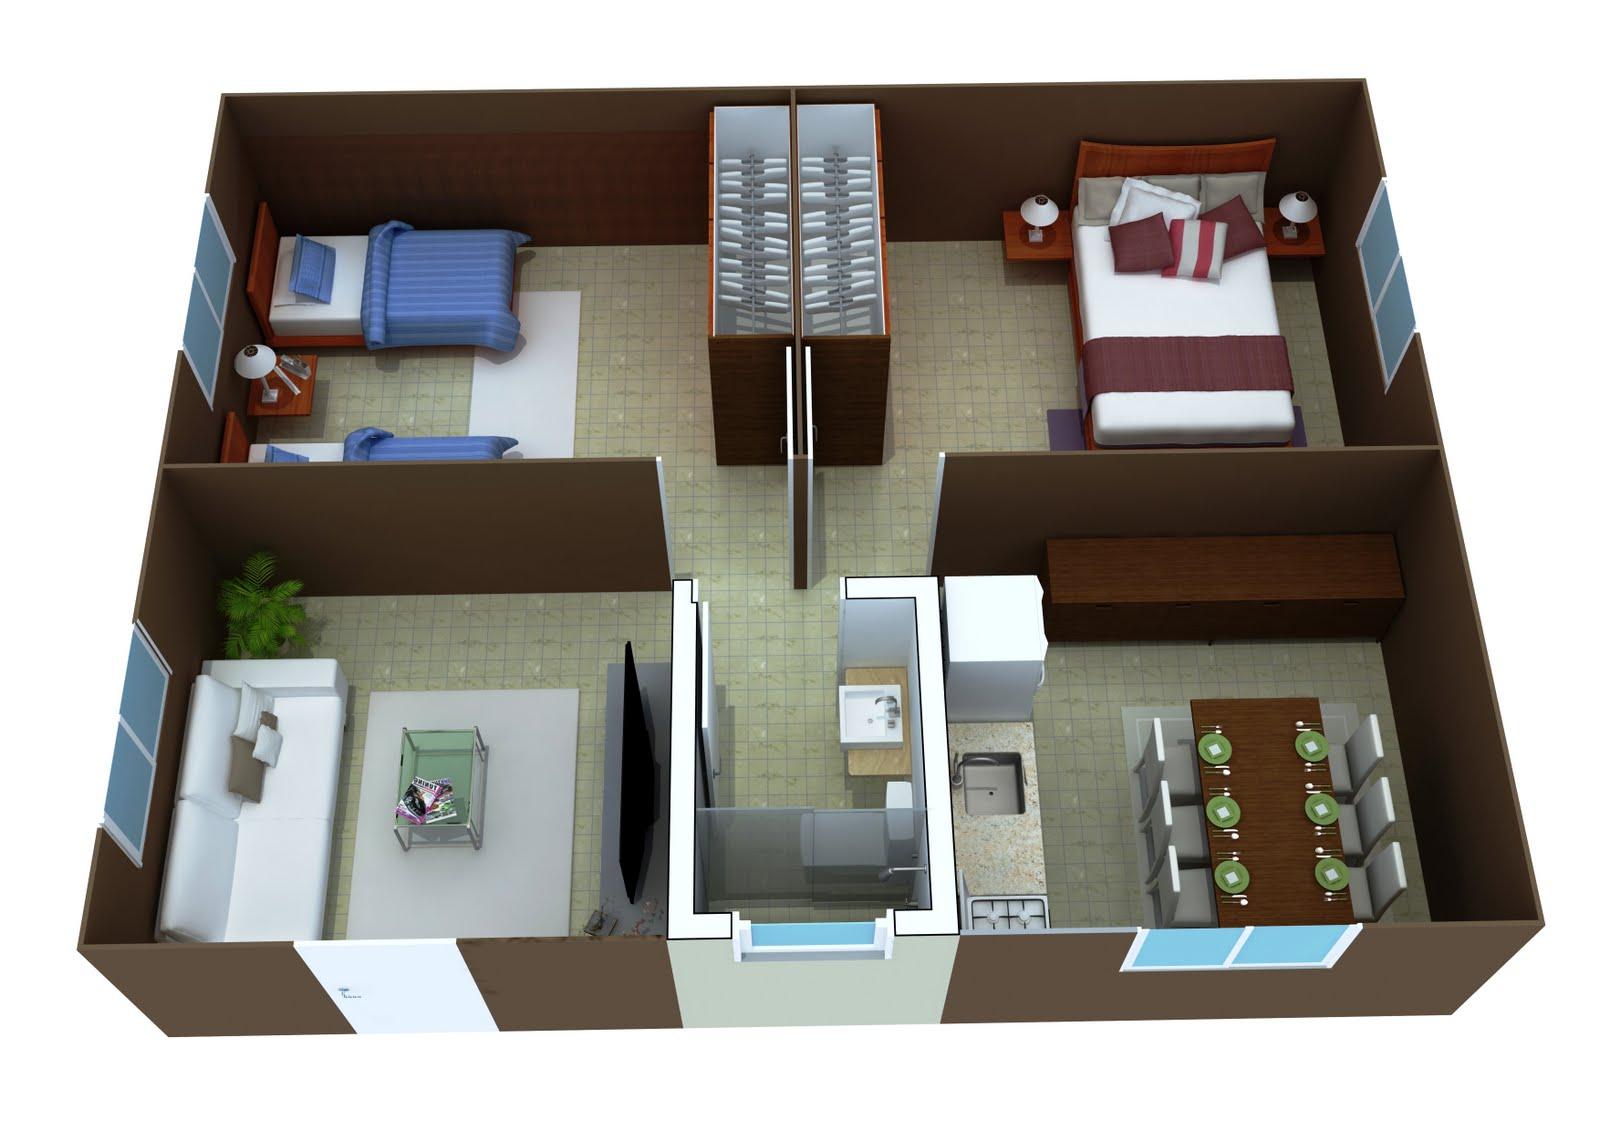 Plantas de casas modelos planta baixa projetos for Modelos de sala de casa